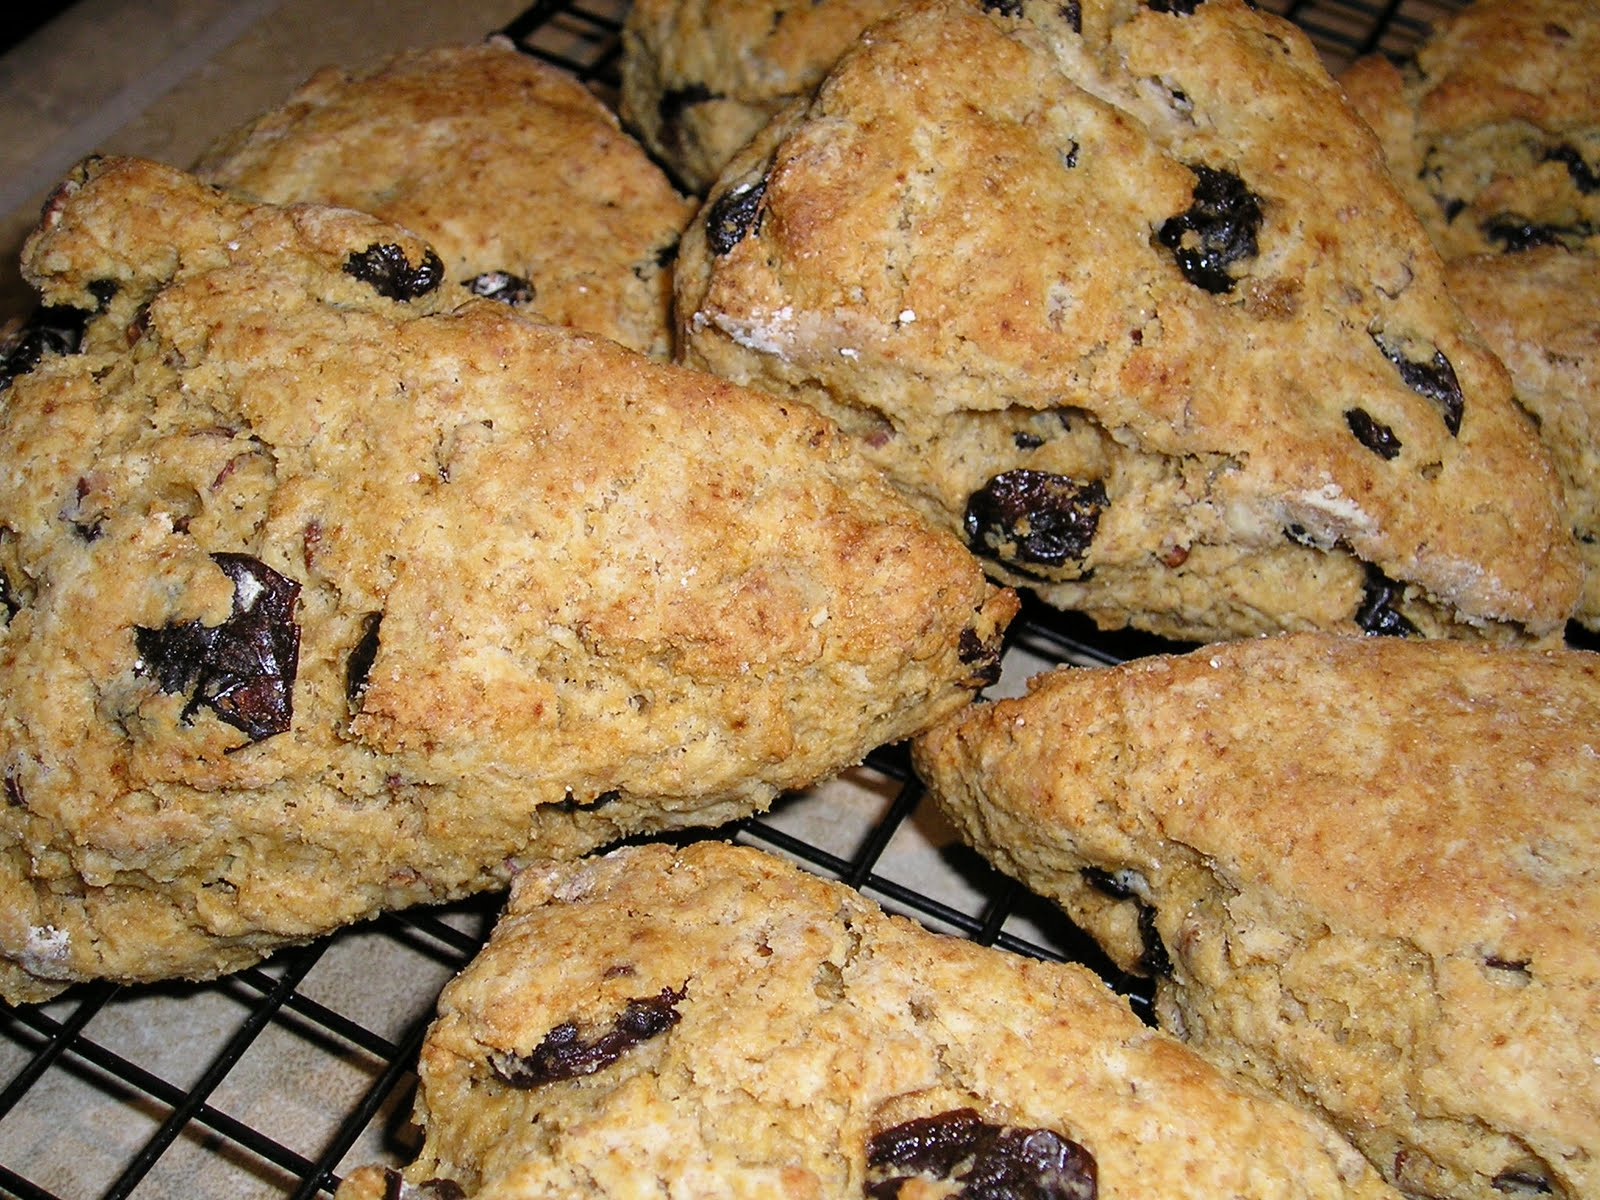 ... oat scones scottish oat scones scottish oat scones scottish oat scones